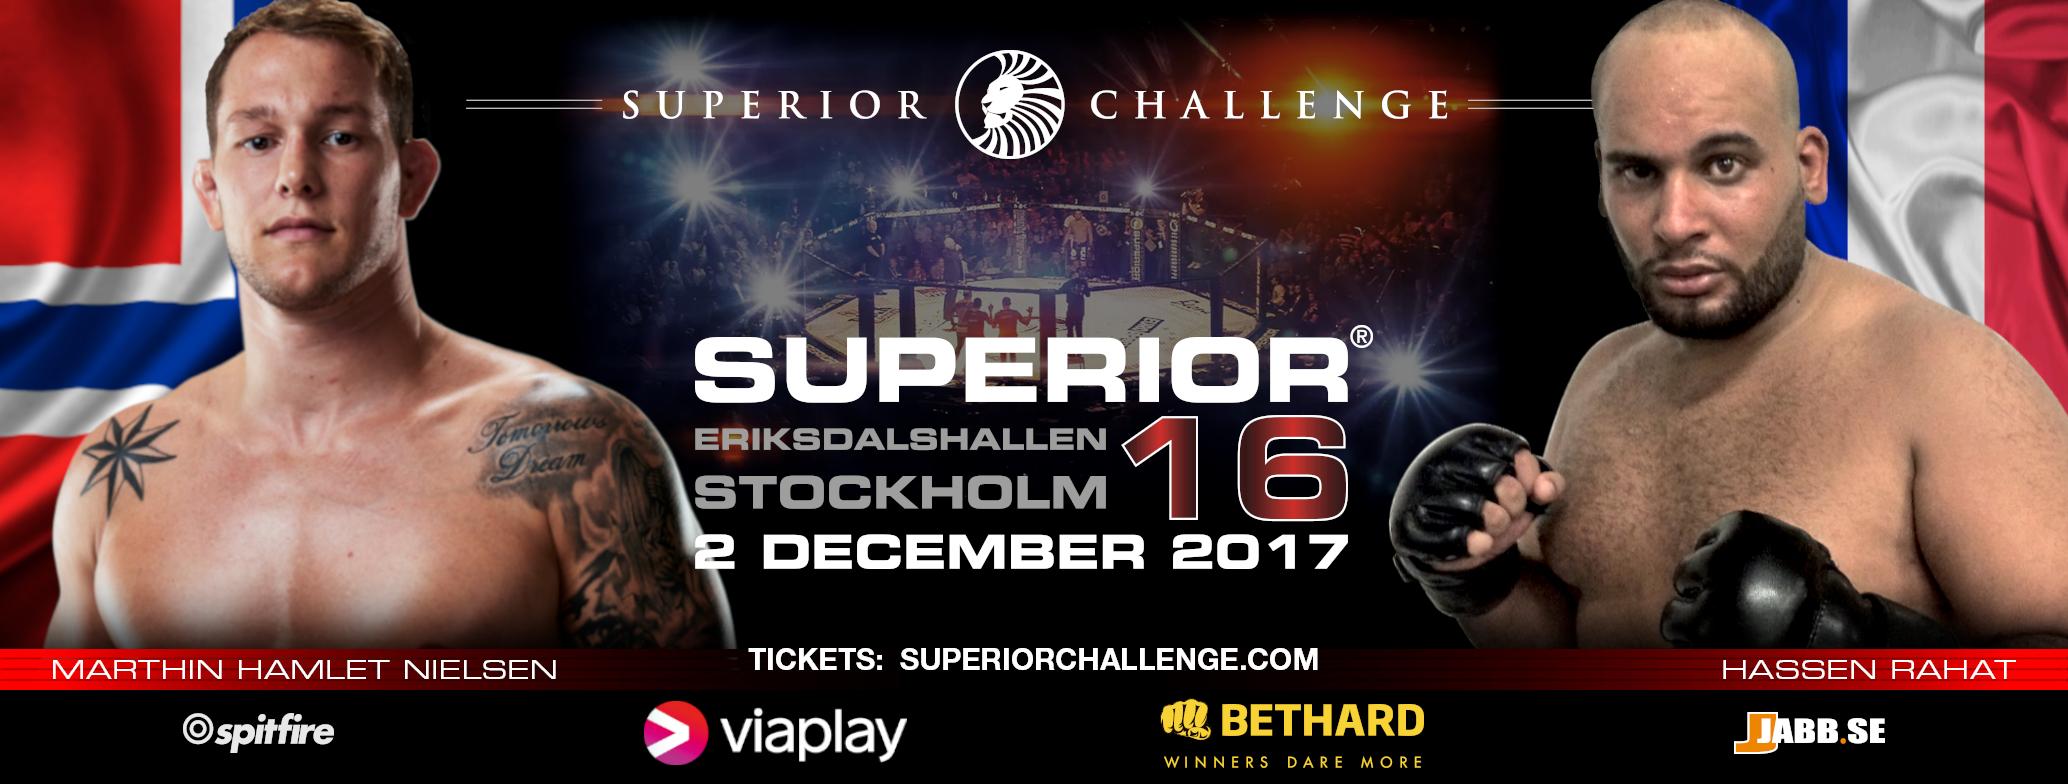 Marthin Hamlet Nielsen vs Hassen Rahat Superior Challenge 16